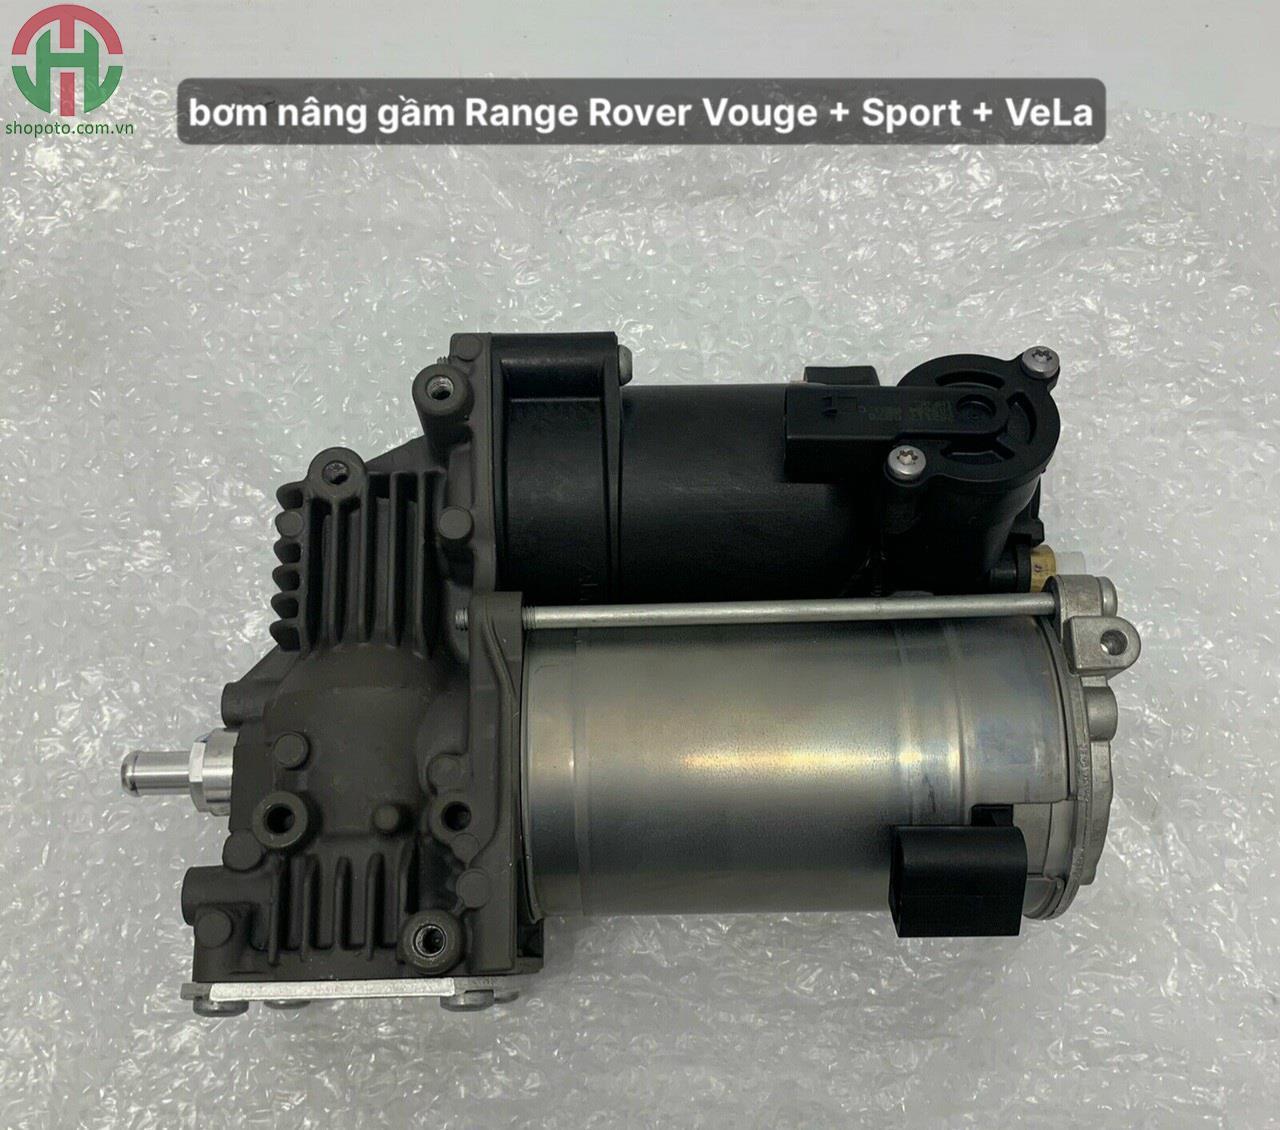 Bơm nâng gầm Range Rover Vouge